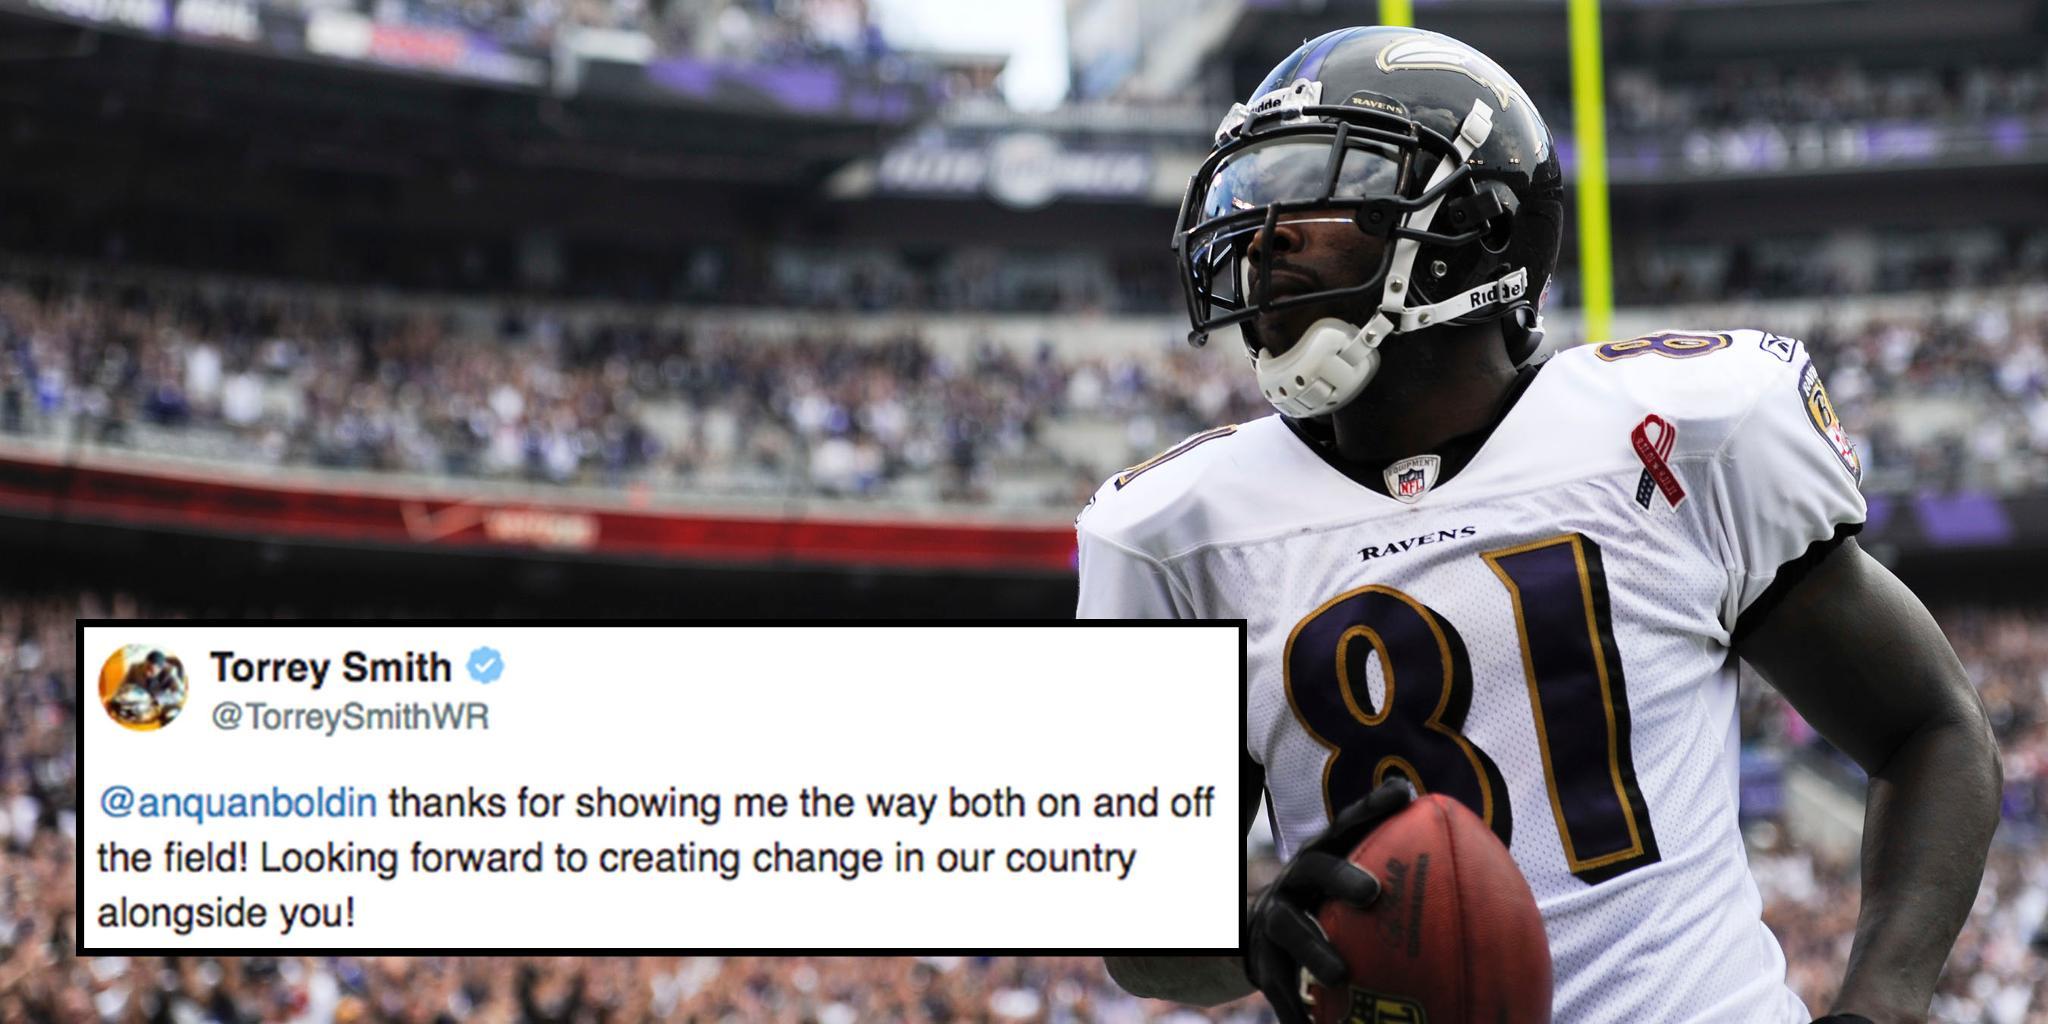 NFL players react to @AnquanBoldin retiring: https://t.co/f3GtCoIsbr https://t.co/FiiiIzYRw8